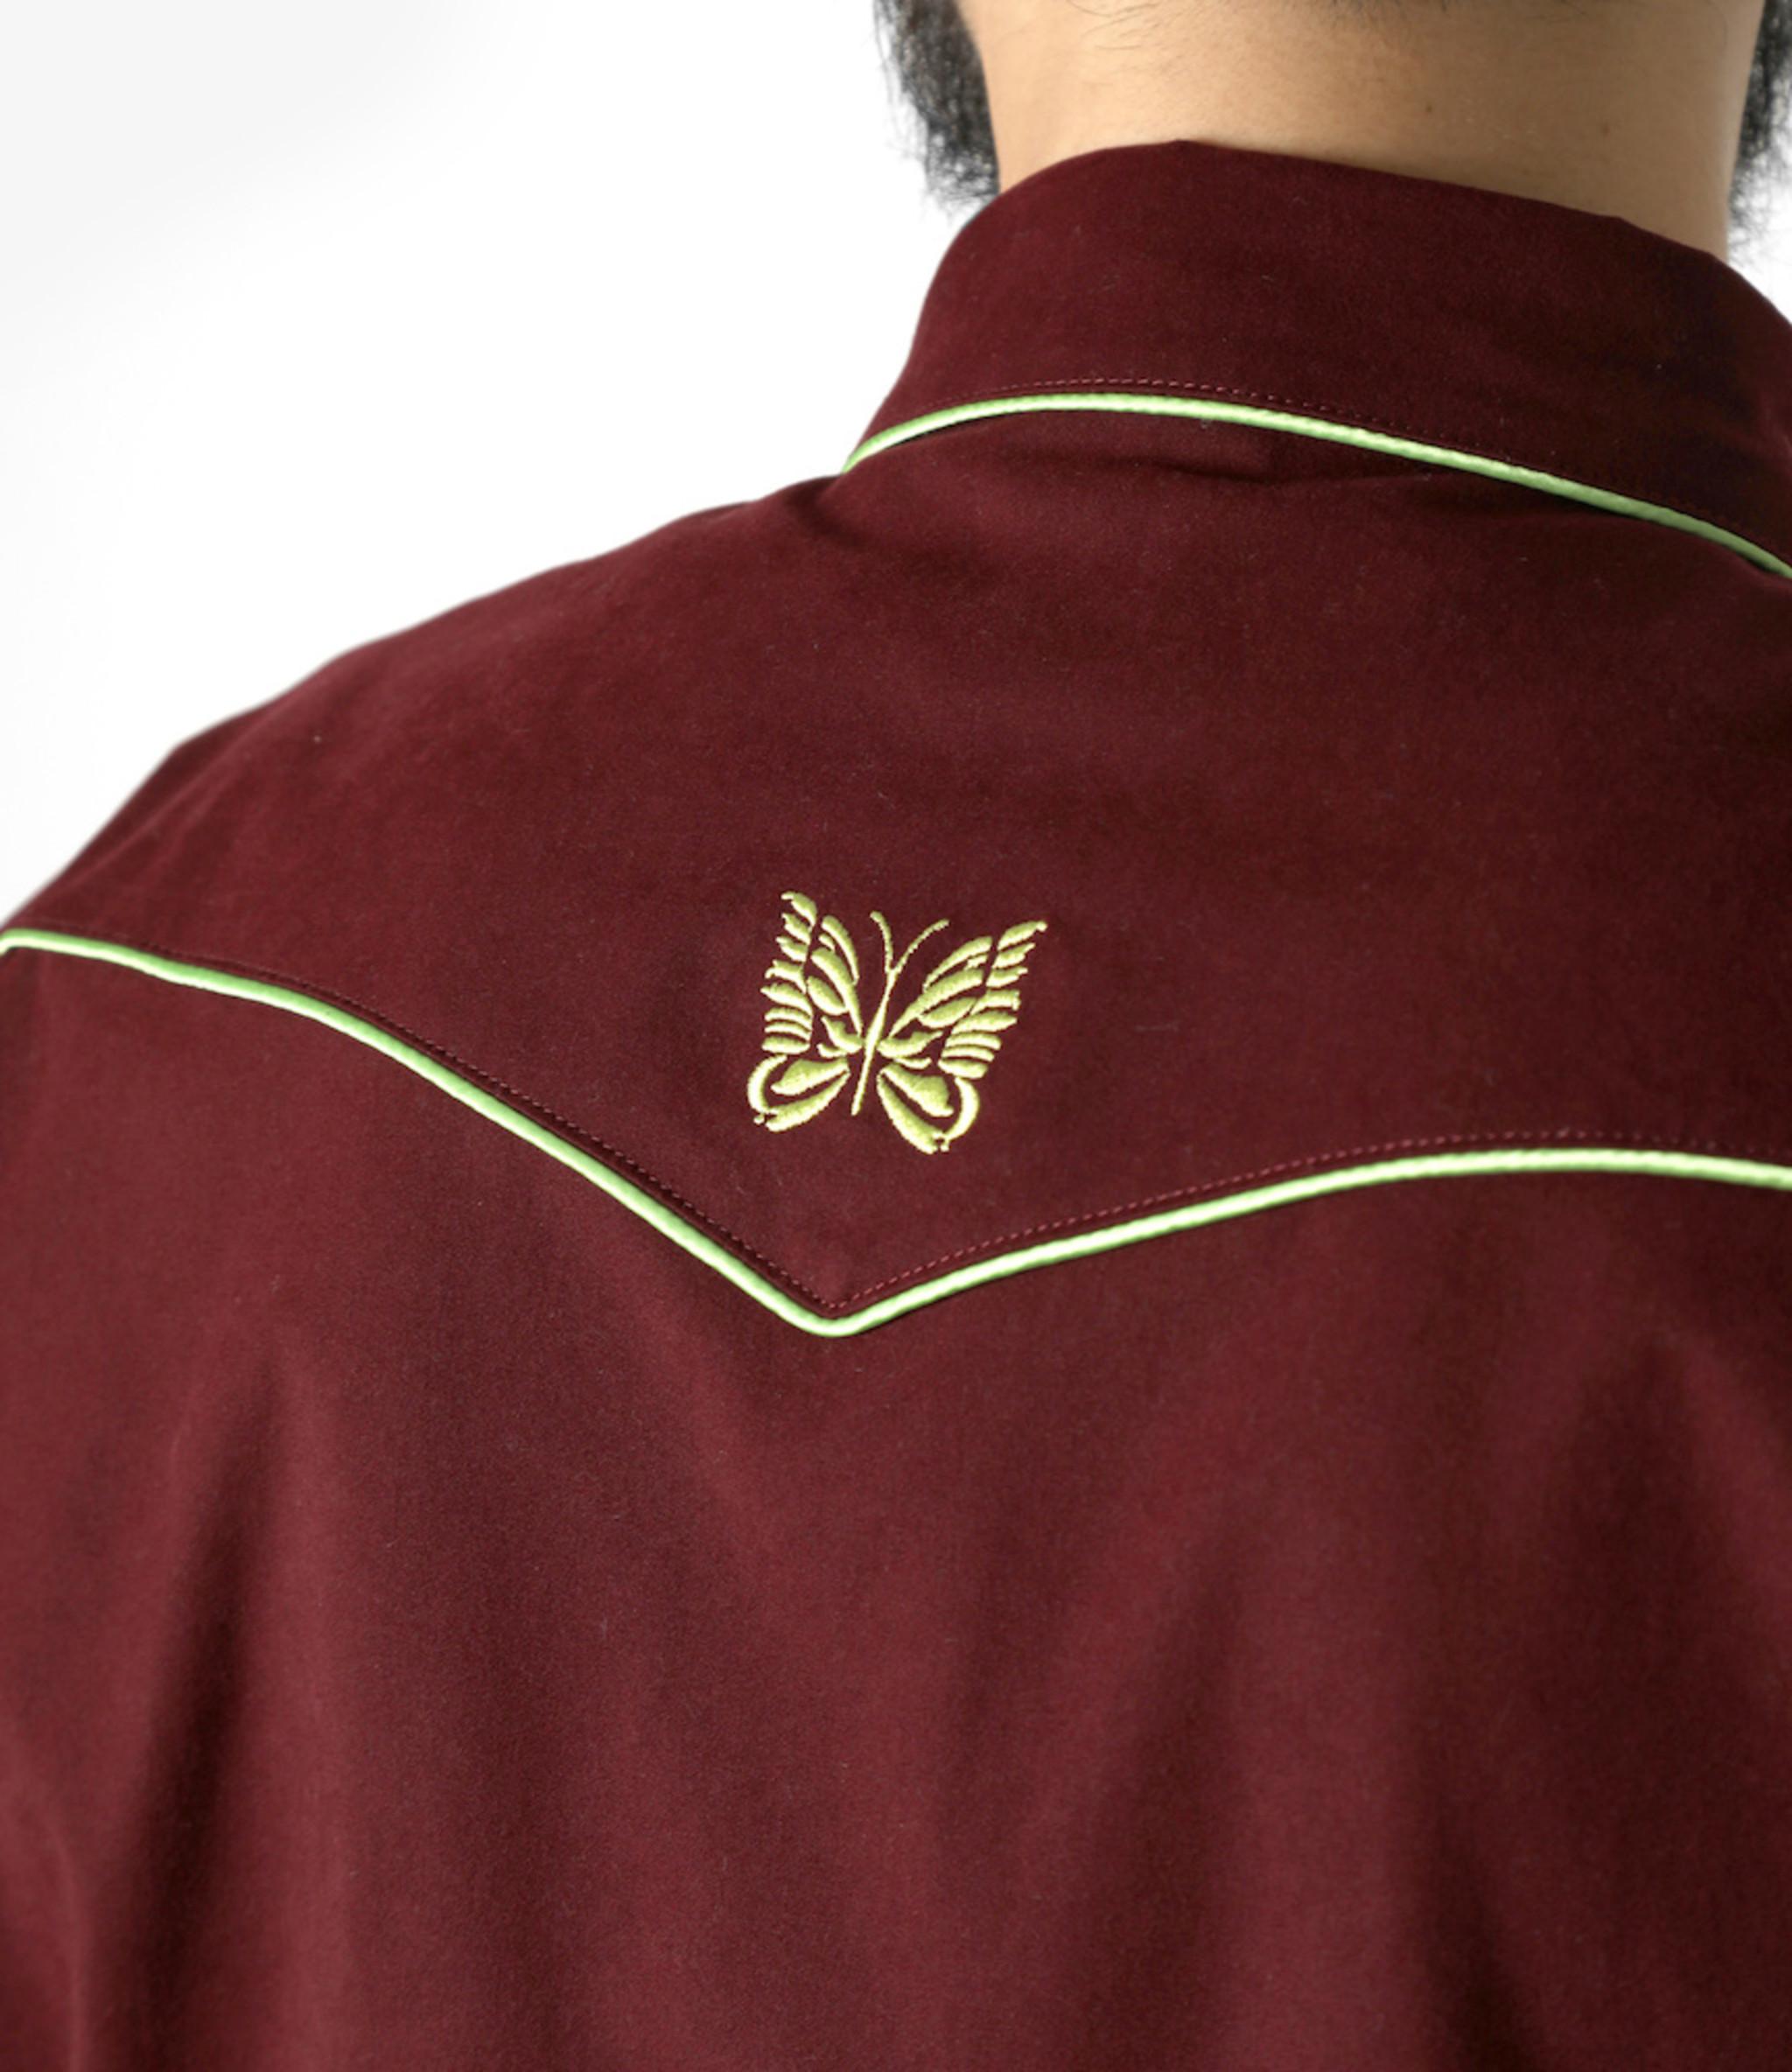 Needles Papillon Emb. Piping Cowboy Shirt - Poly Peach Twill - Bordeaux